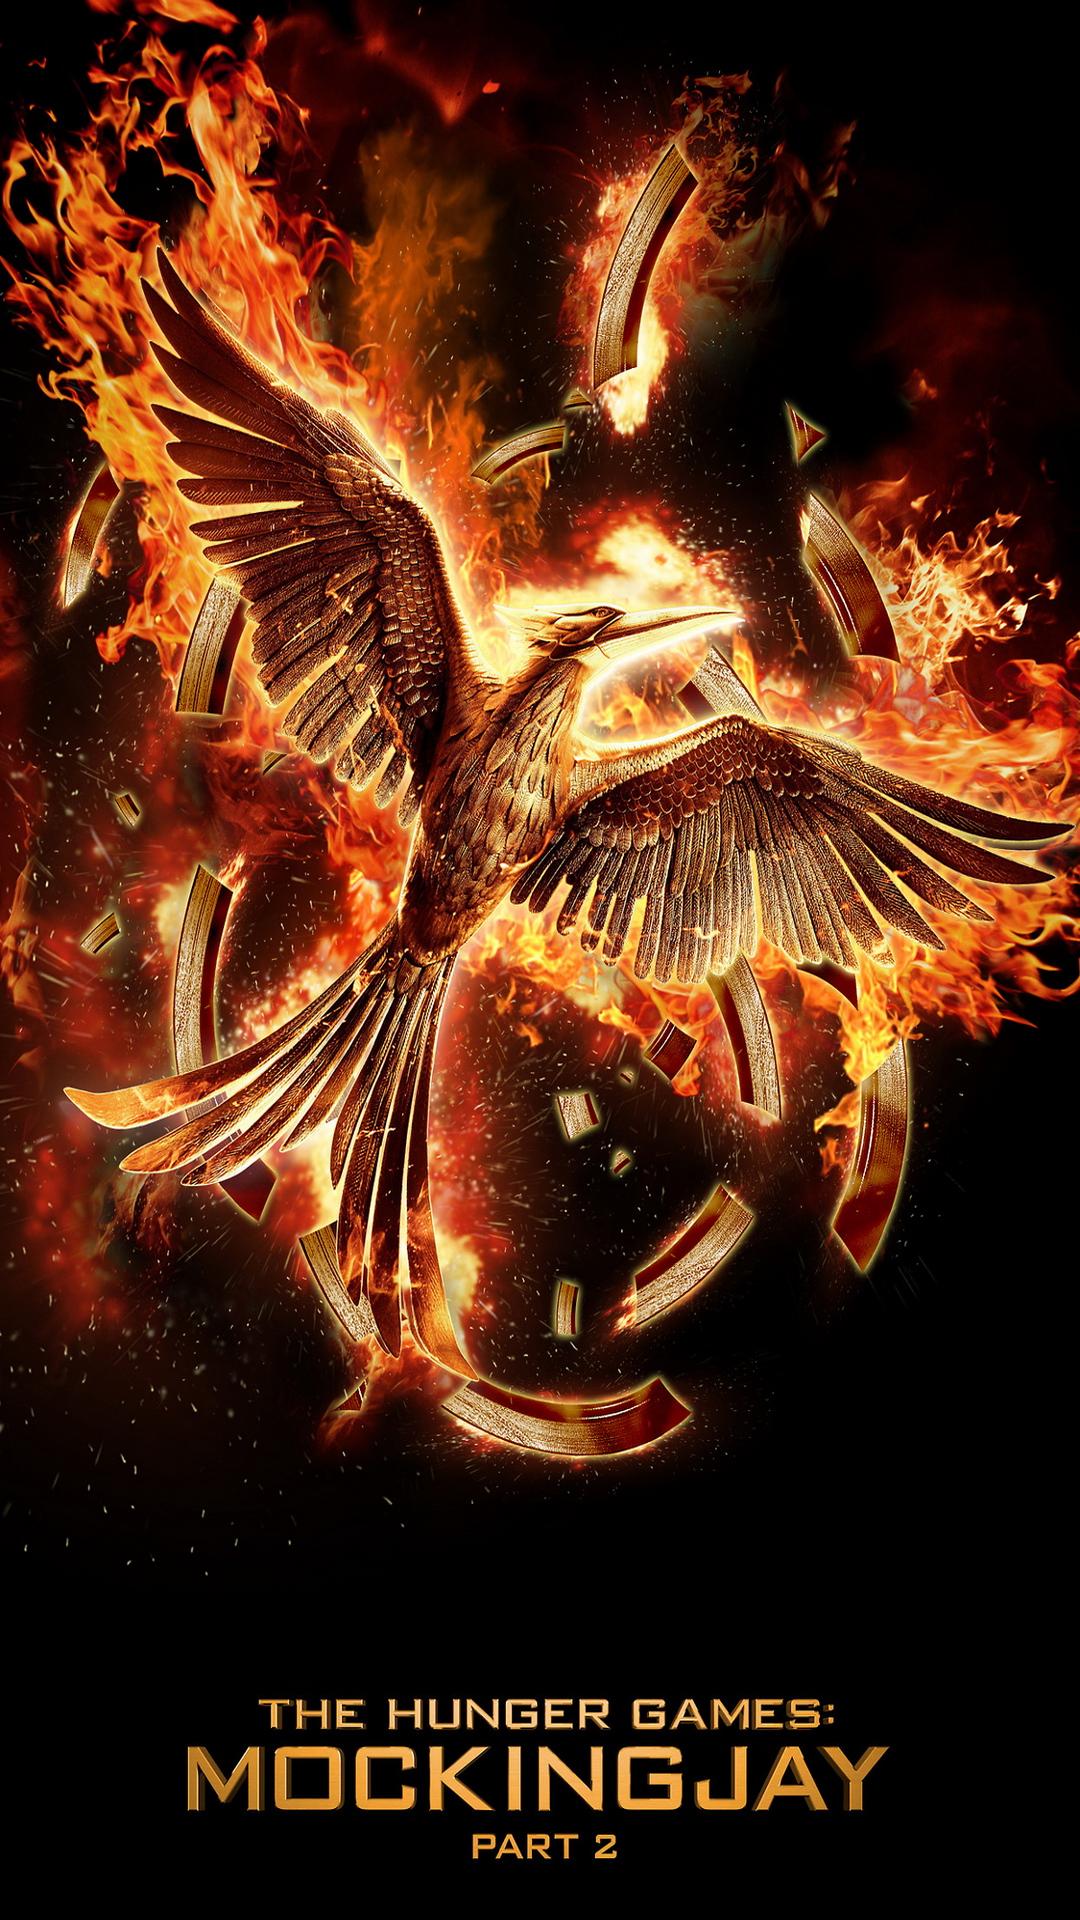 [49+] Hunger Games Wallpaper iPhone on WallpaperSafari